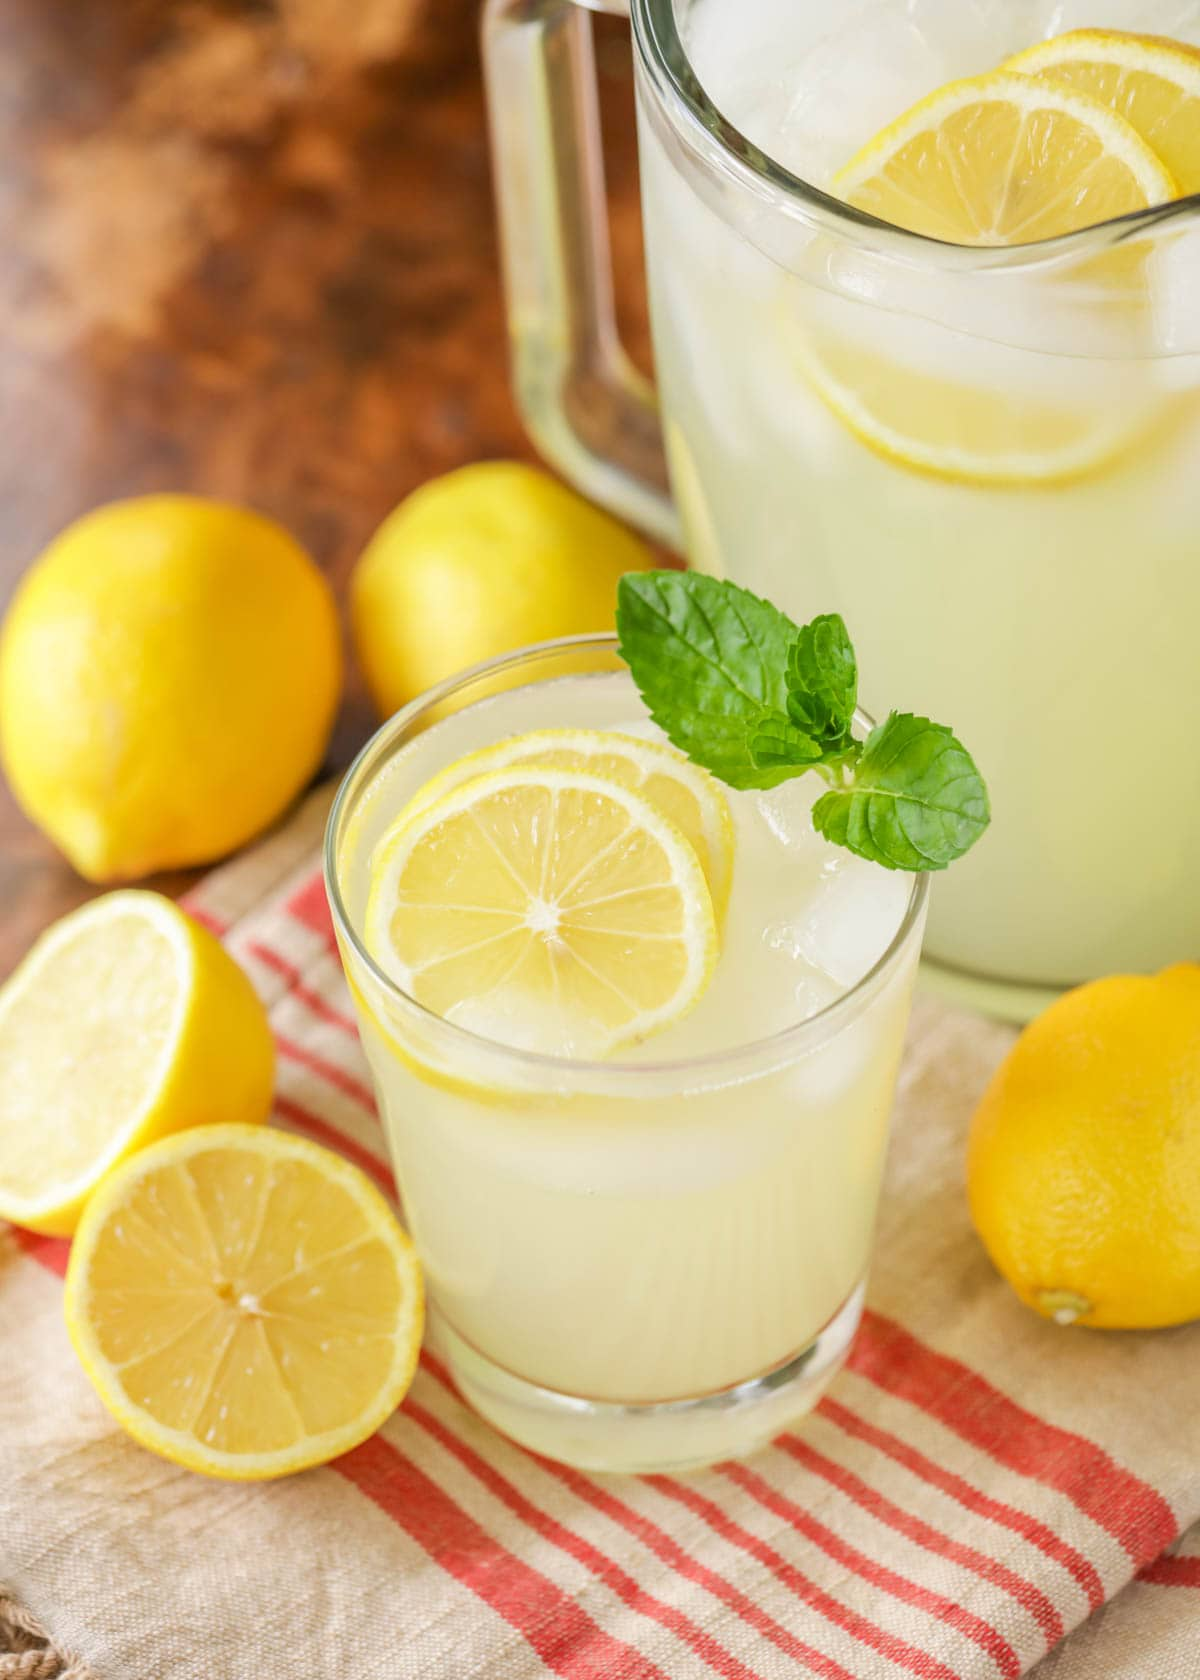 Lemonade recipe with a slice of lemon and mint